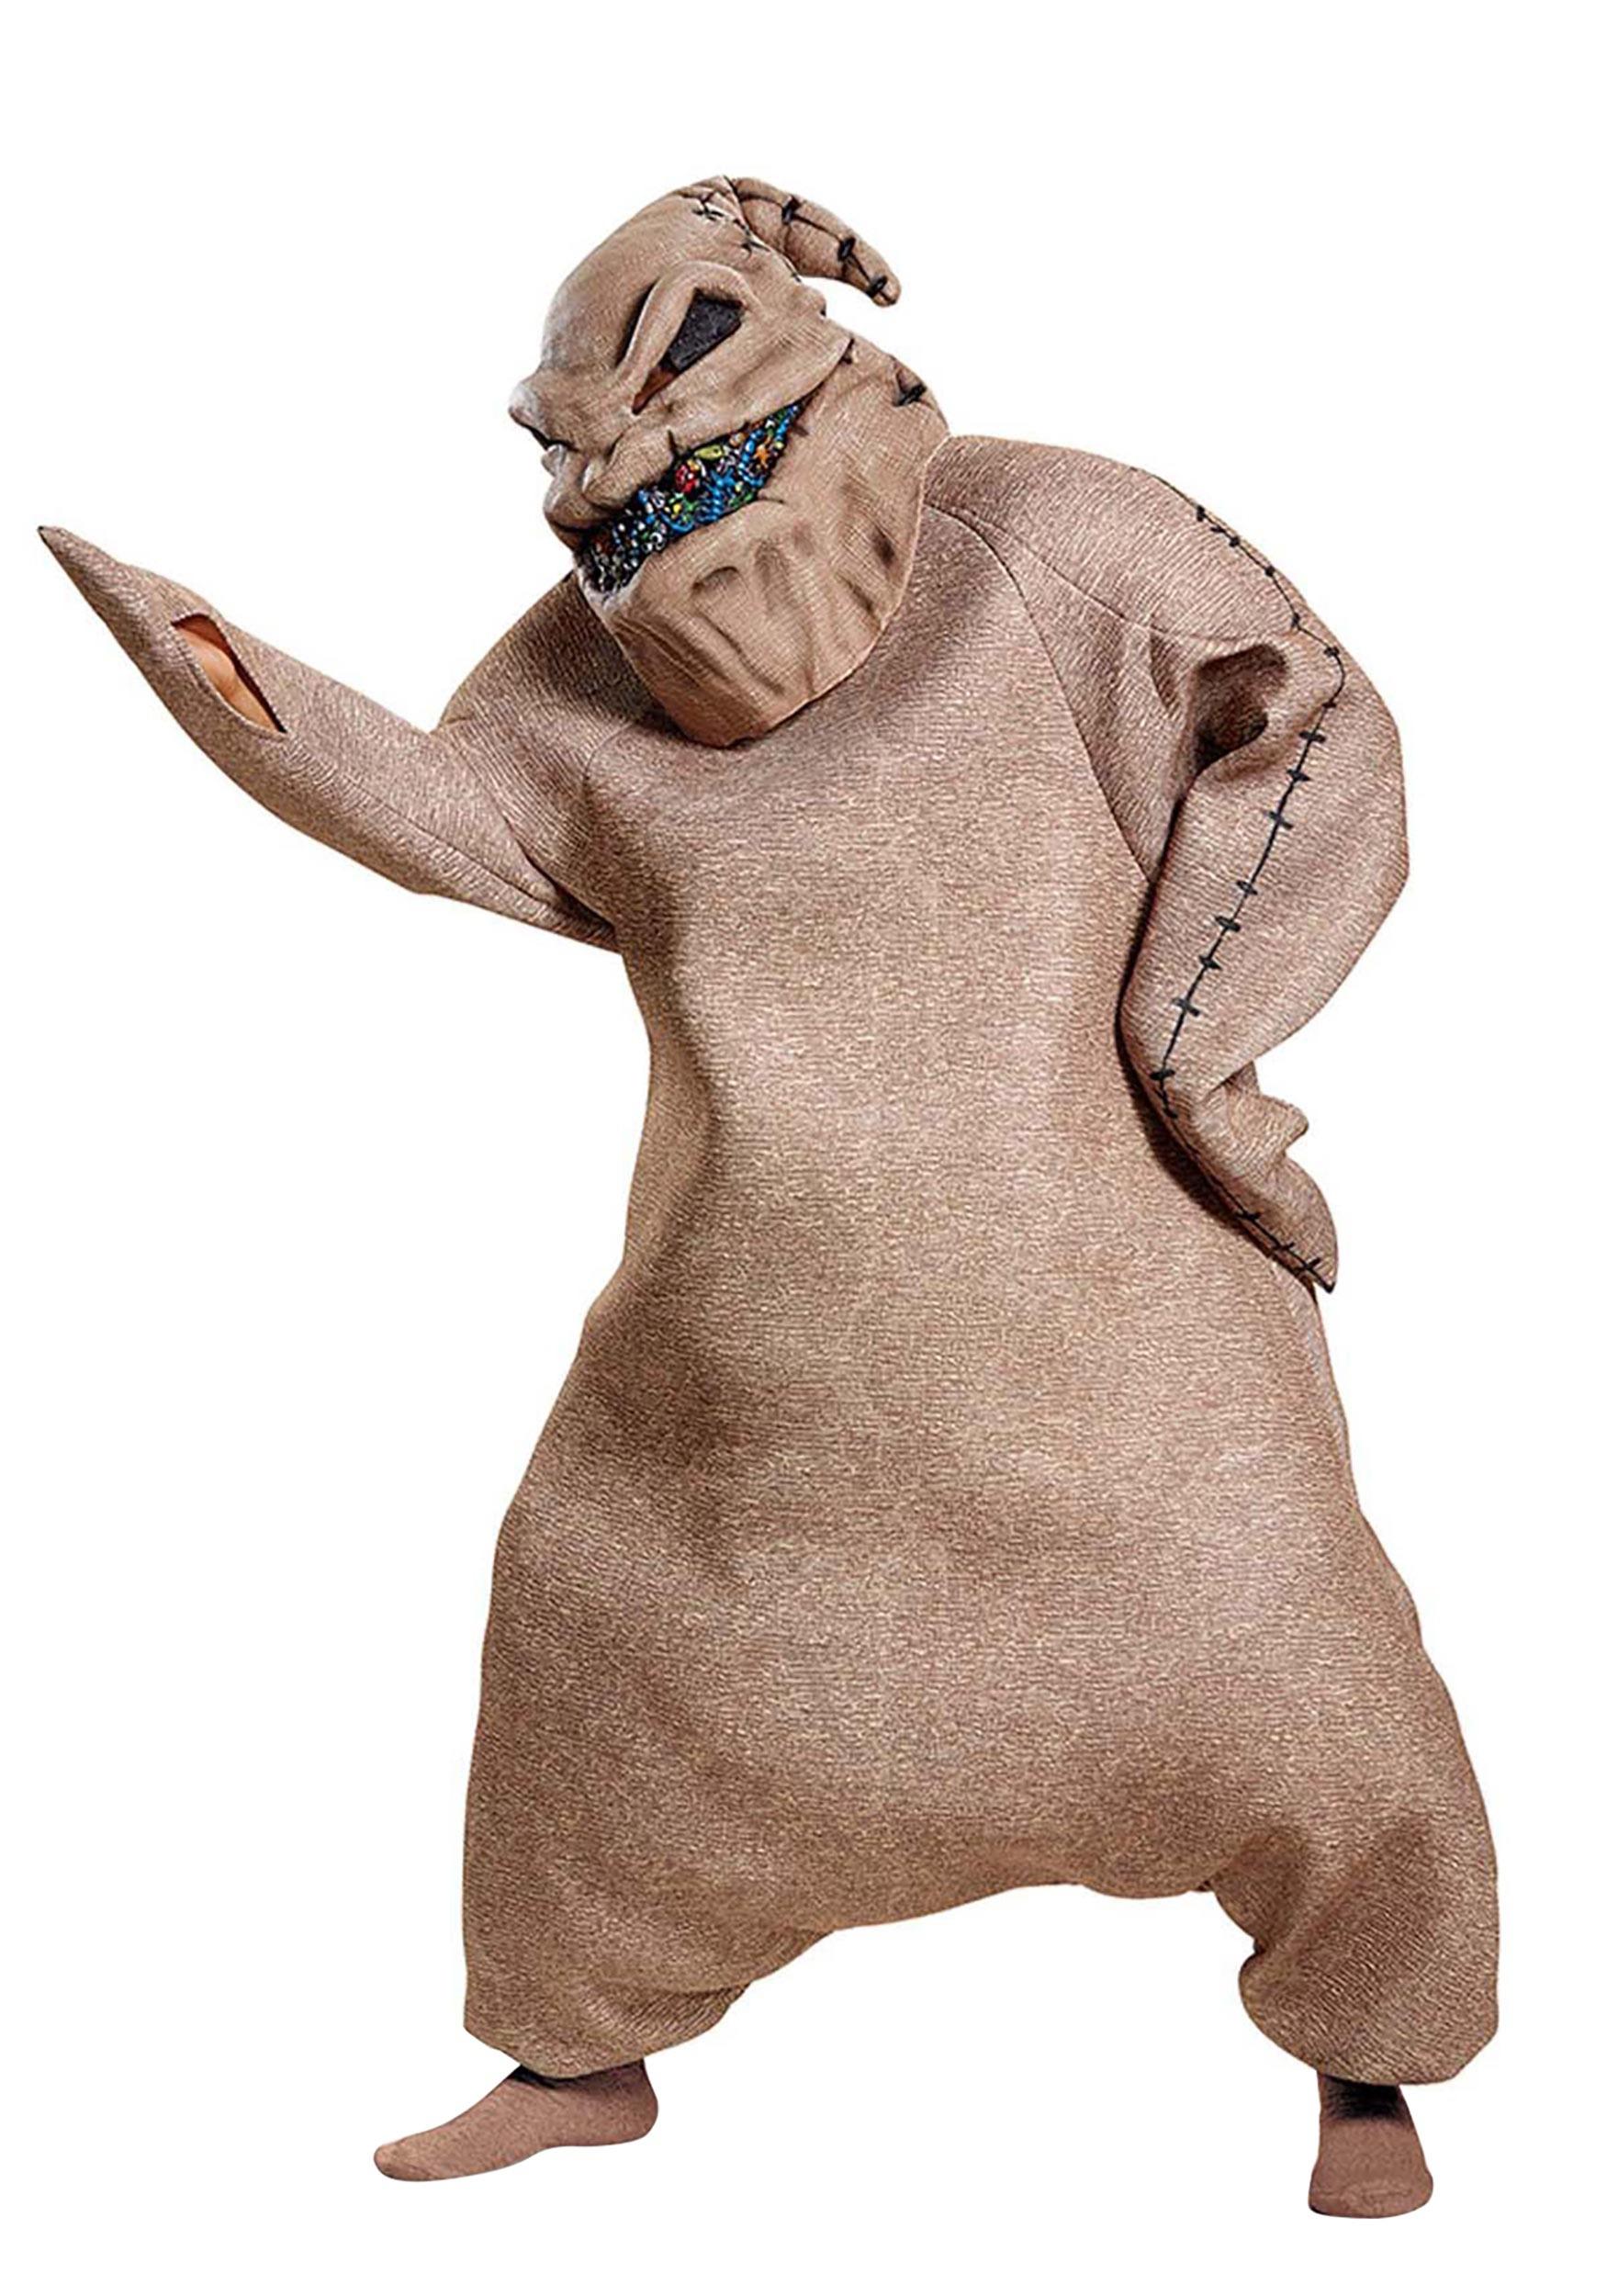 Oogie Boogie Prestige Costume From Nightmare Before Christmas 1 year ago1 year ago. adult costume oogie boogie prestige